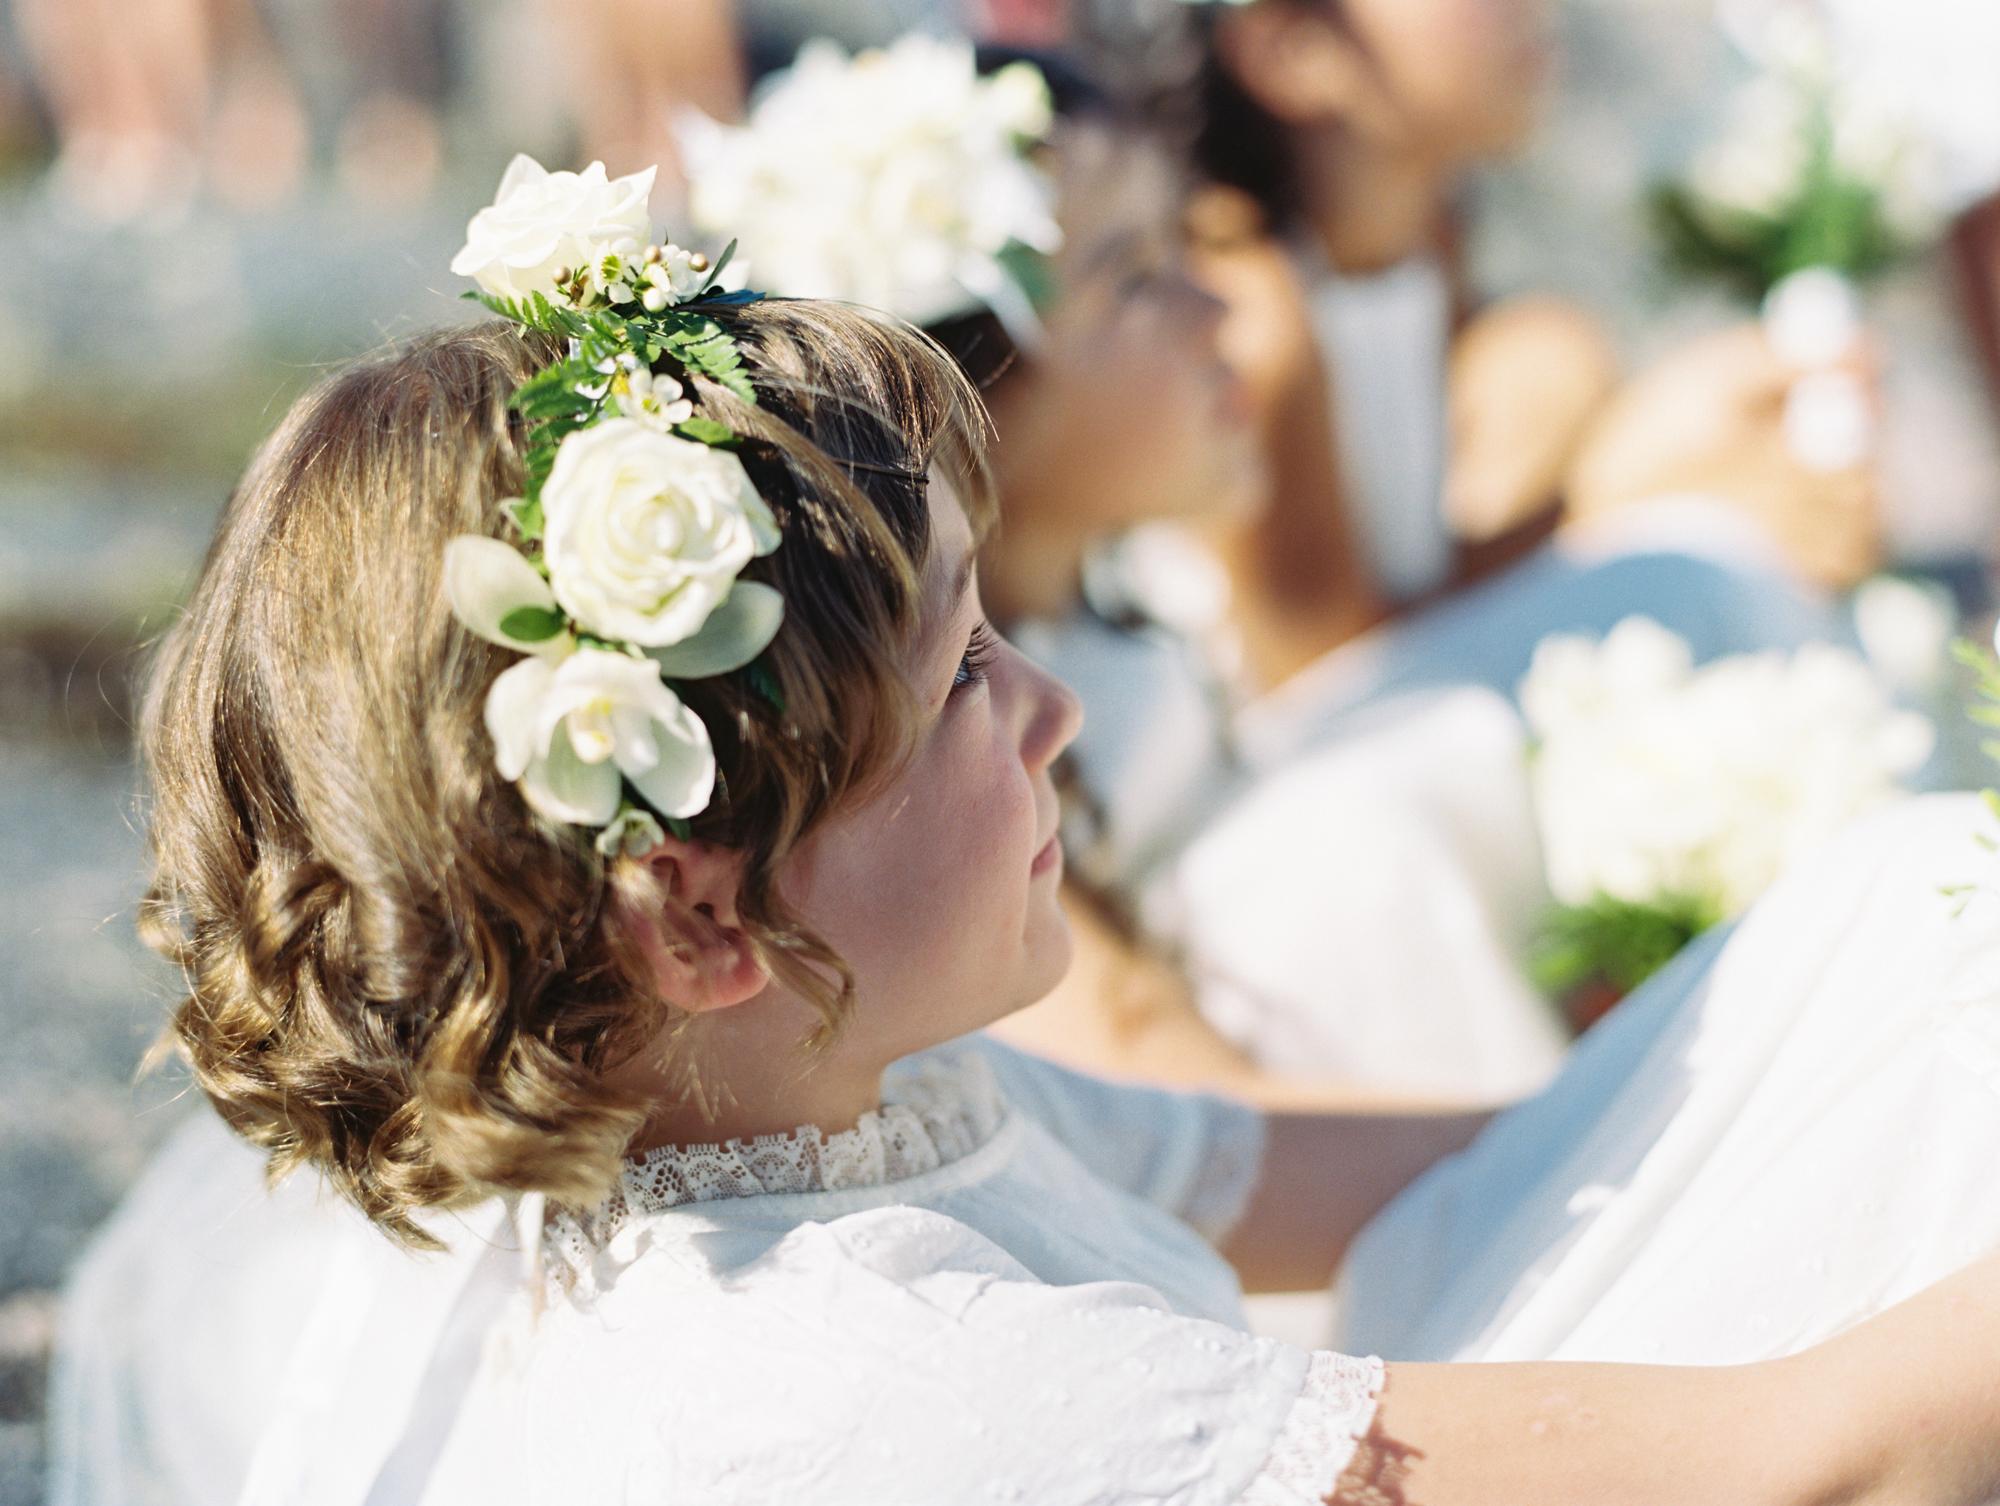 Bride's daughter watching ceremony